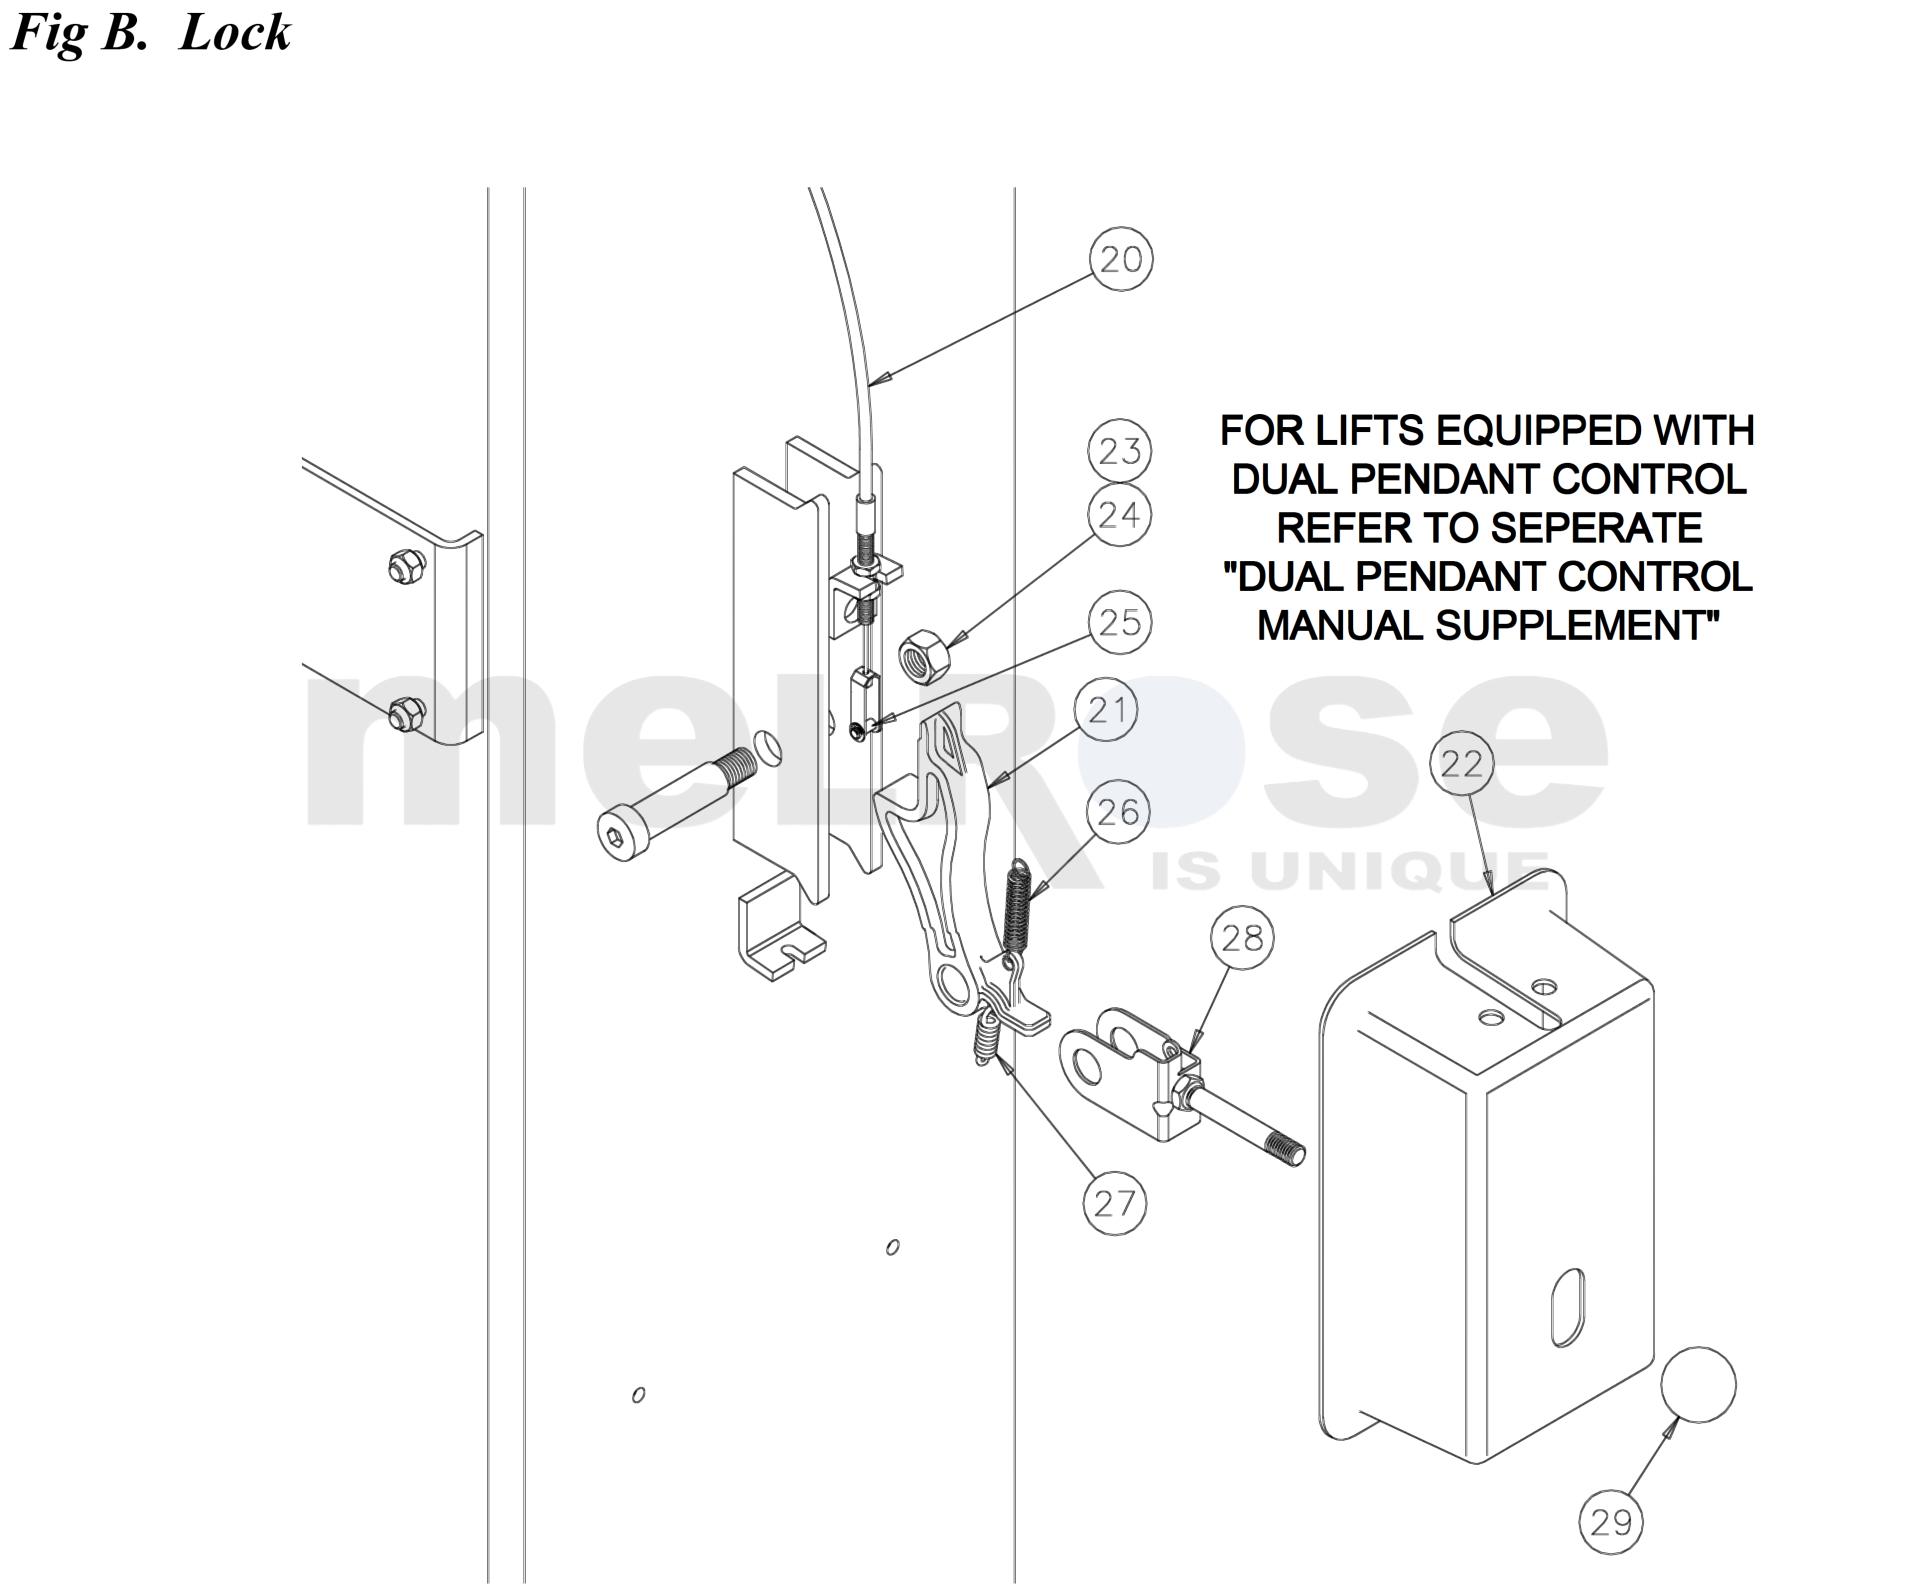 cl10-lock-diagram-ii-marked.jpg